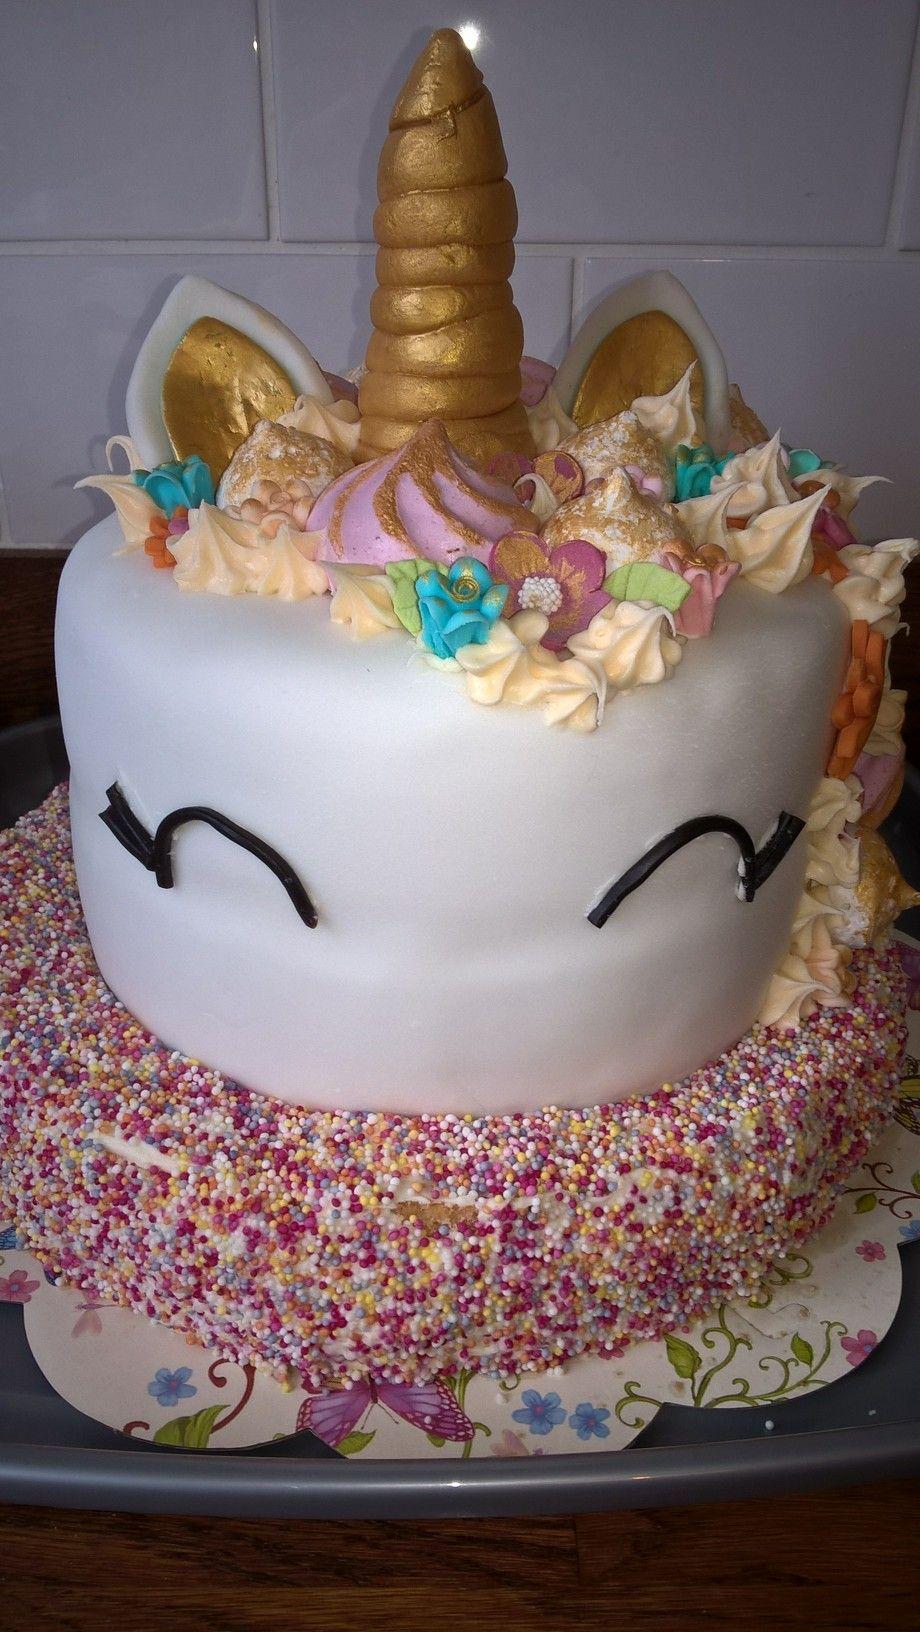 Happy Birthday to my youngest Happy birthday me